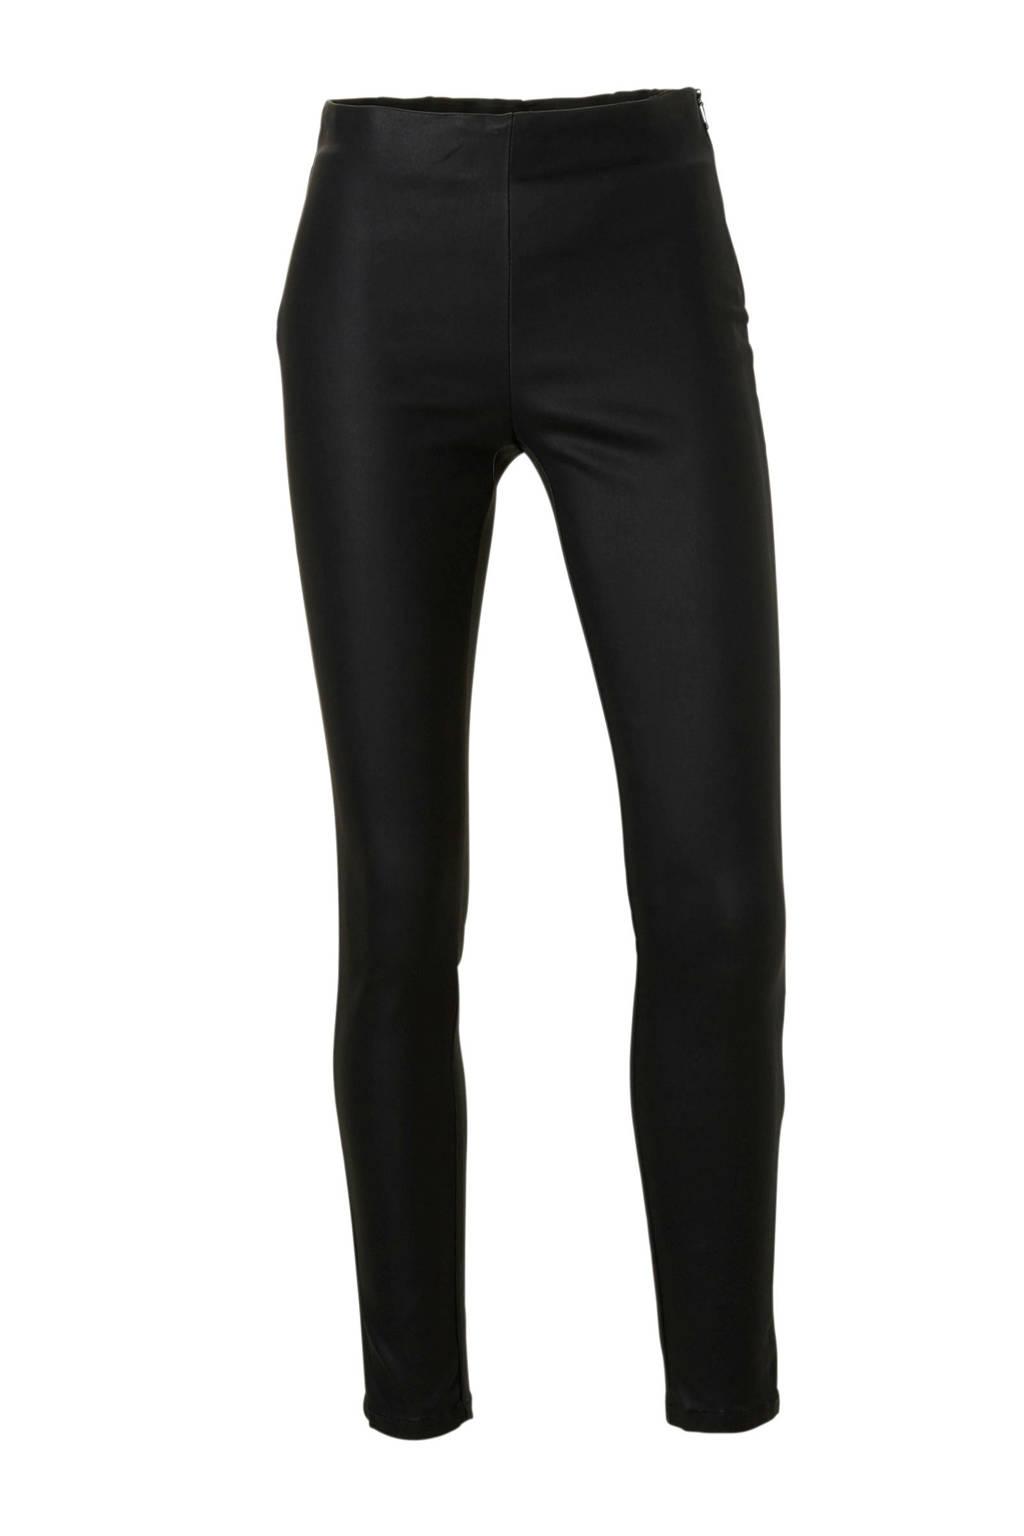 edc Women skinny fit broek, Zwart